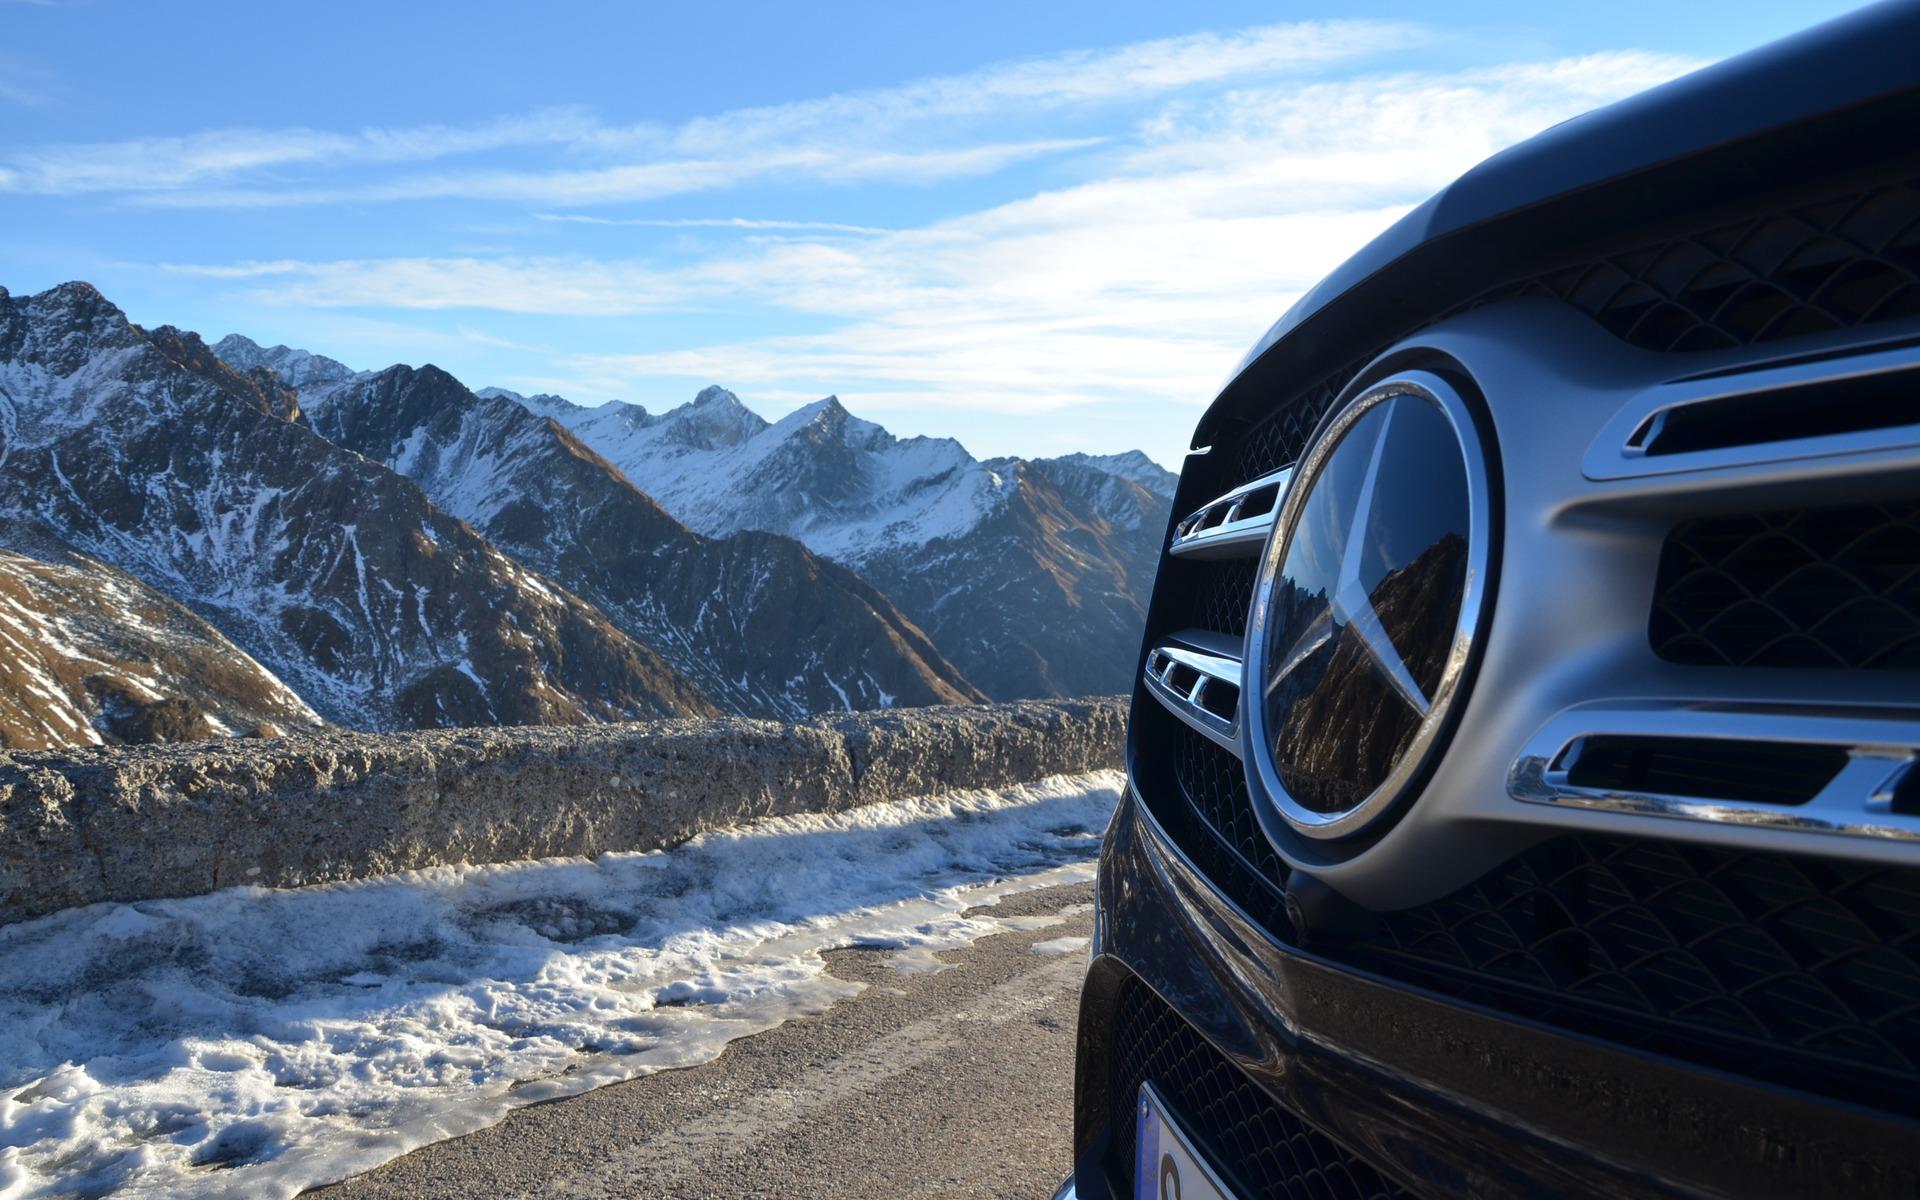 Mercedes Benz Gls >> 2017 Mercedes-Benz GLS: The S-Class Of SUVs - 19/25